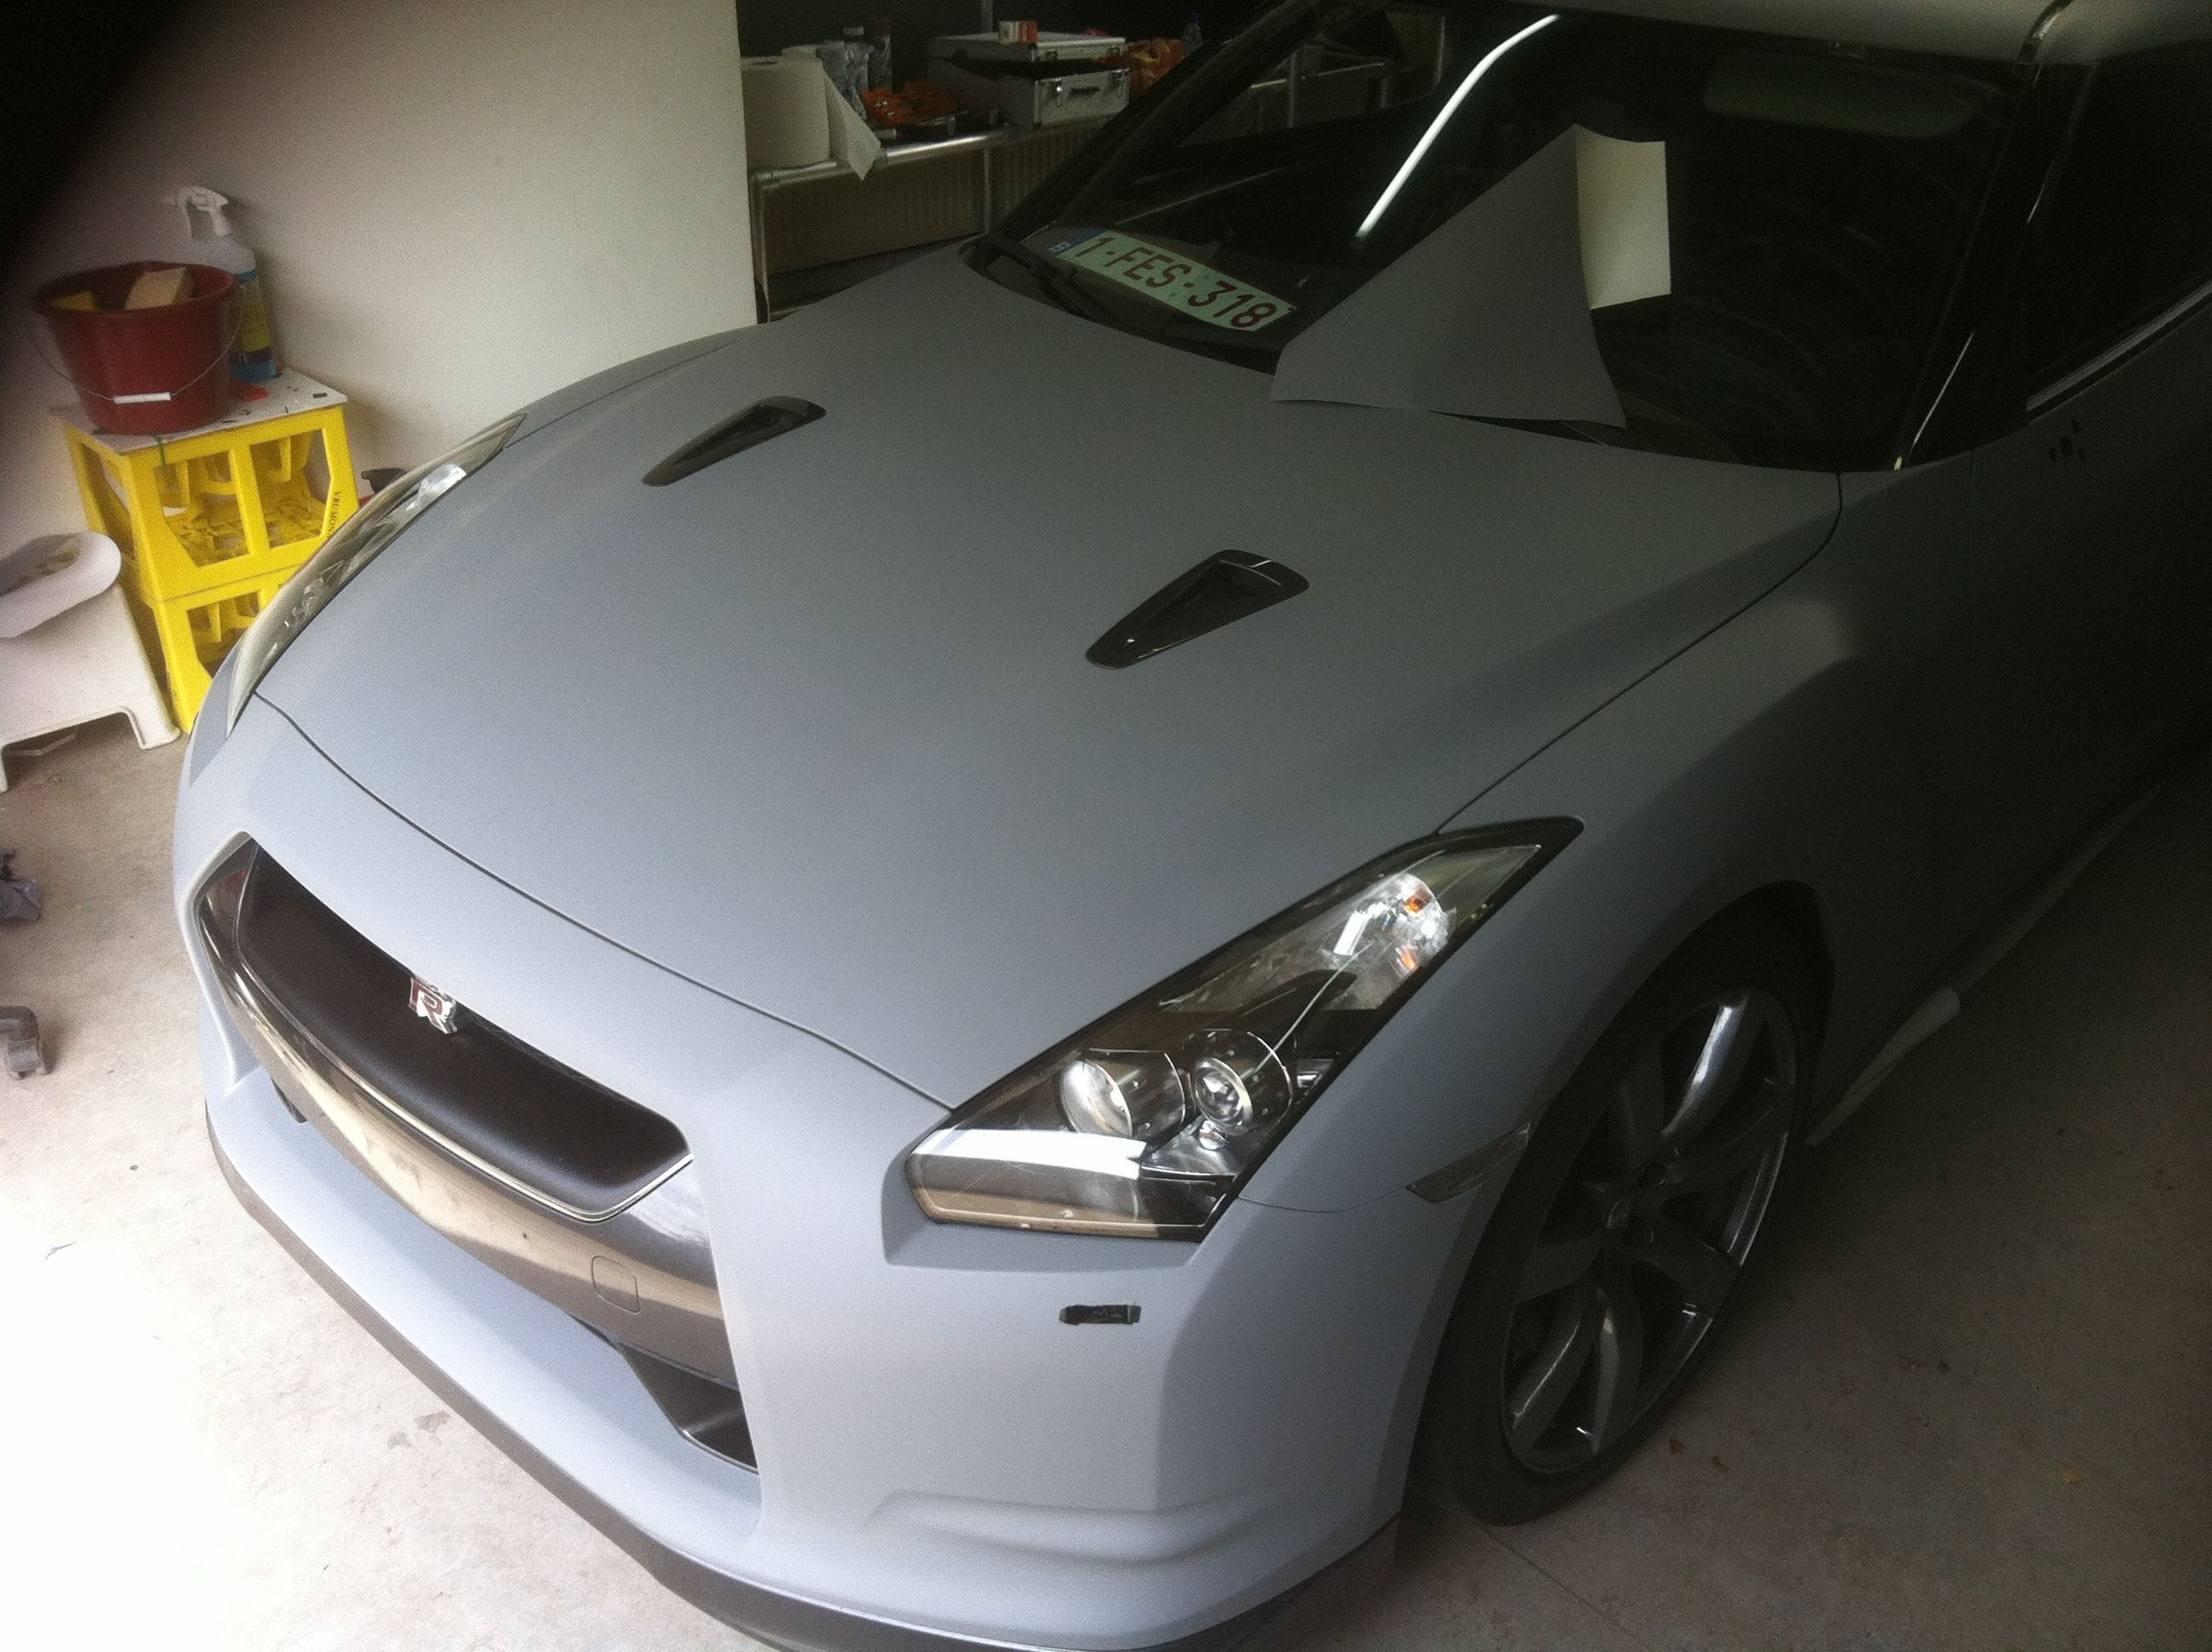 Nissan GT-R met Mat Grijze Wrap, Carwrapping door Wrapmyride.nu Foto-nr:6550, ©2020